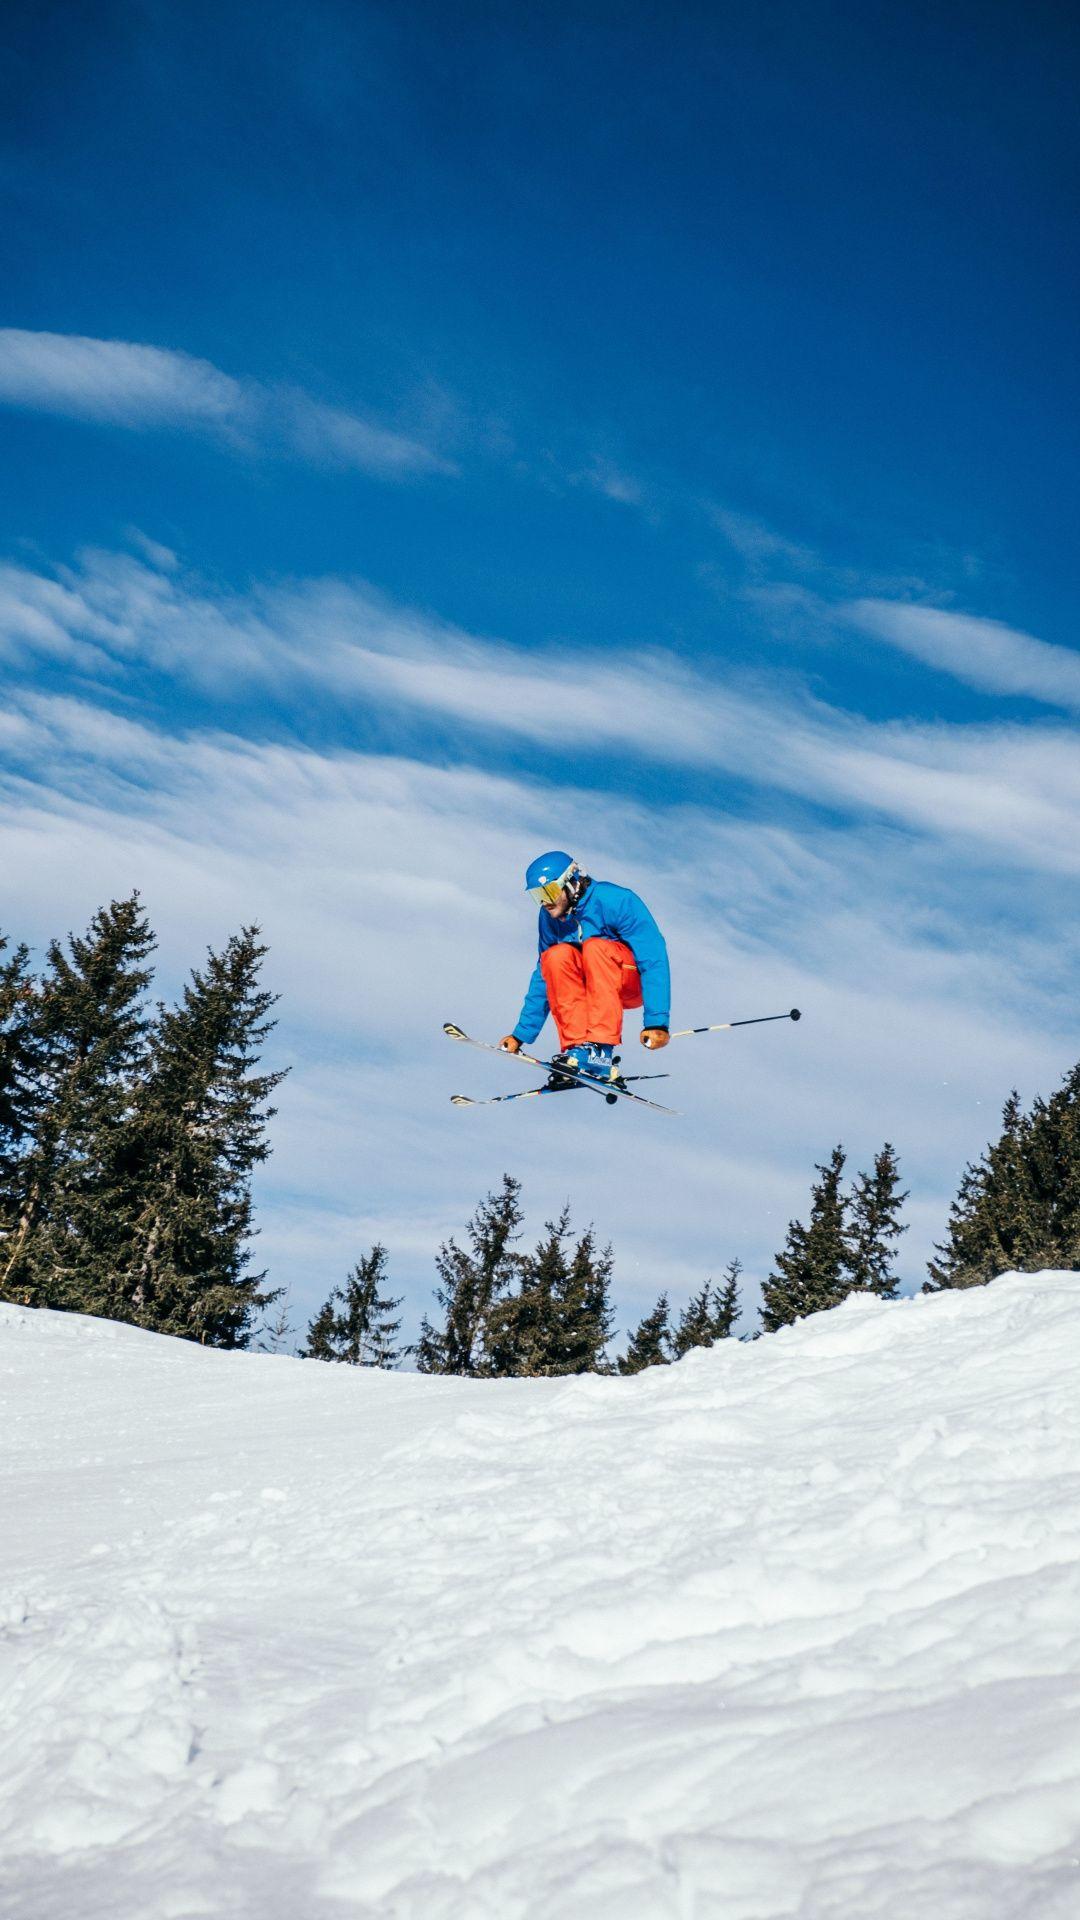 Sports Winter Skiing 1080x1920 Wallpaper Wallpaper Mountain Wallpaper Free Hd Wallpapers